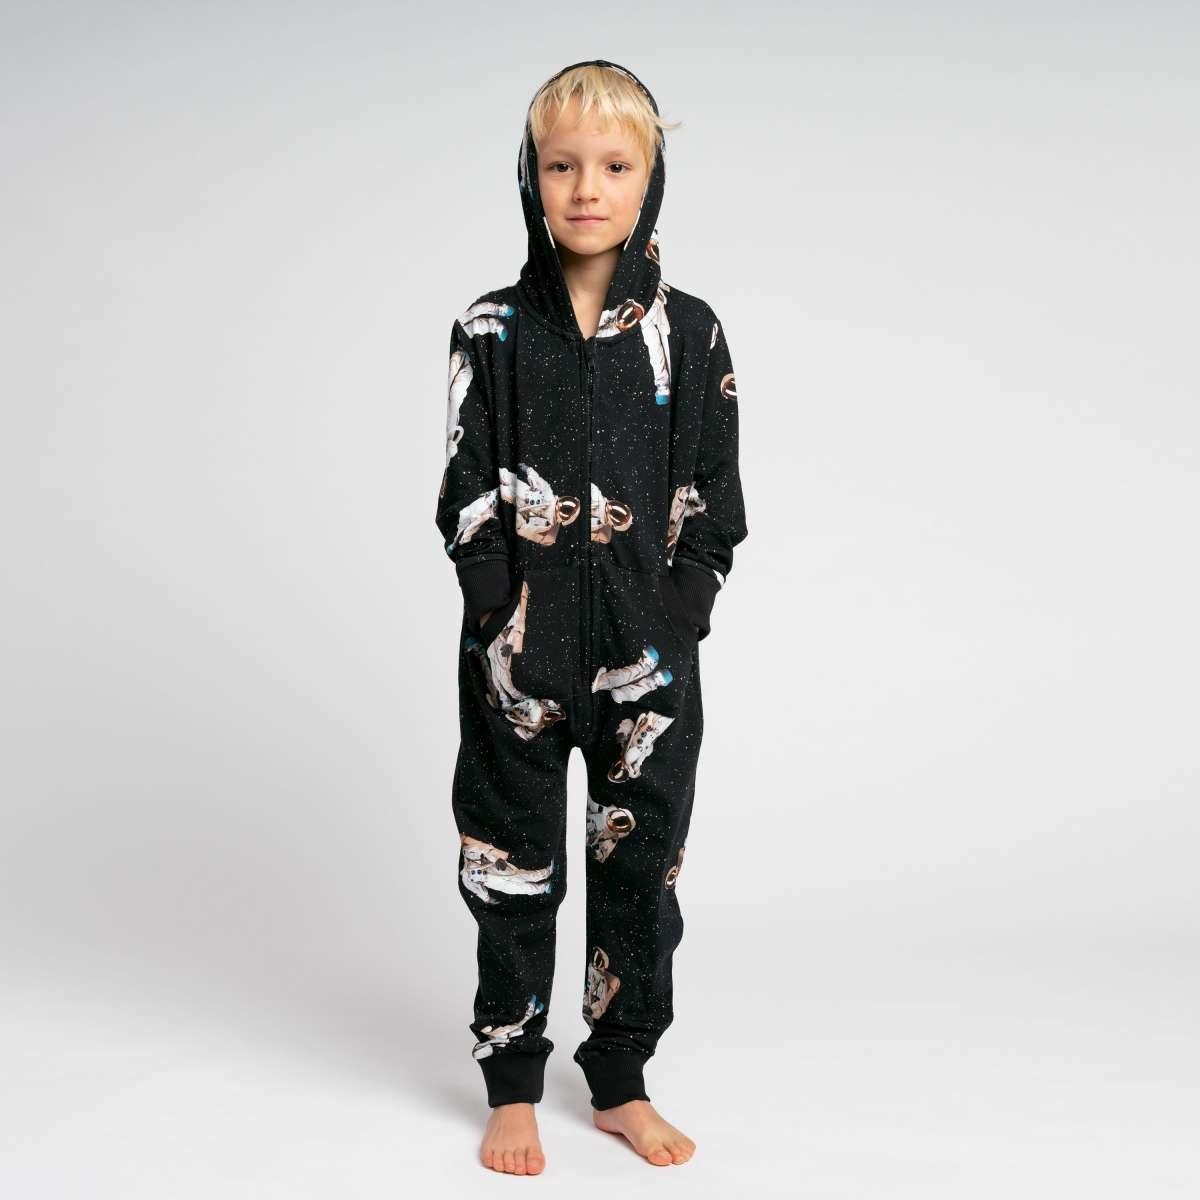 Jumpsuit - Astro - Sz 5/6-1